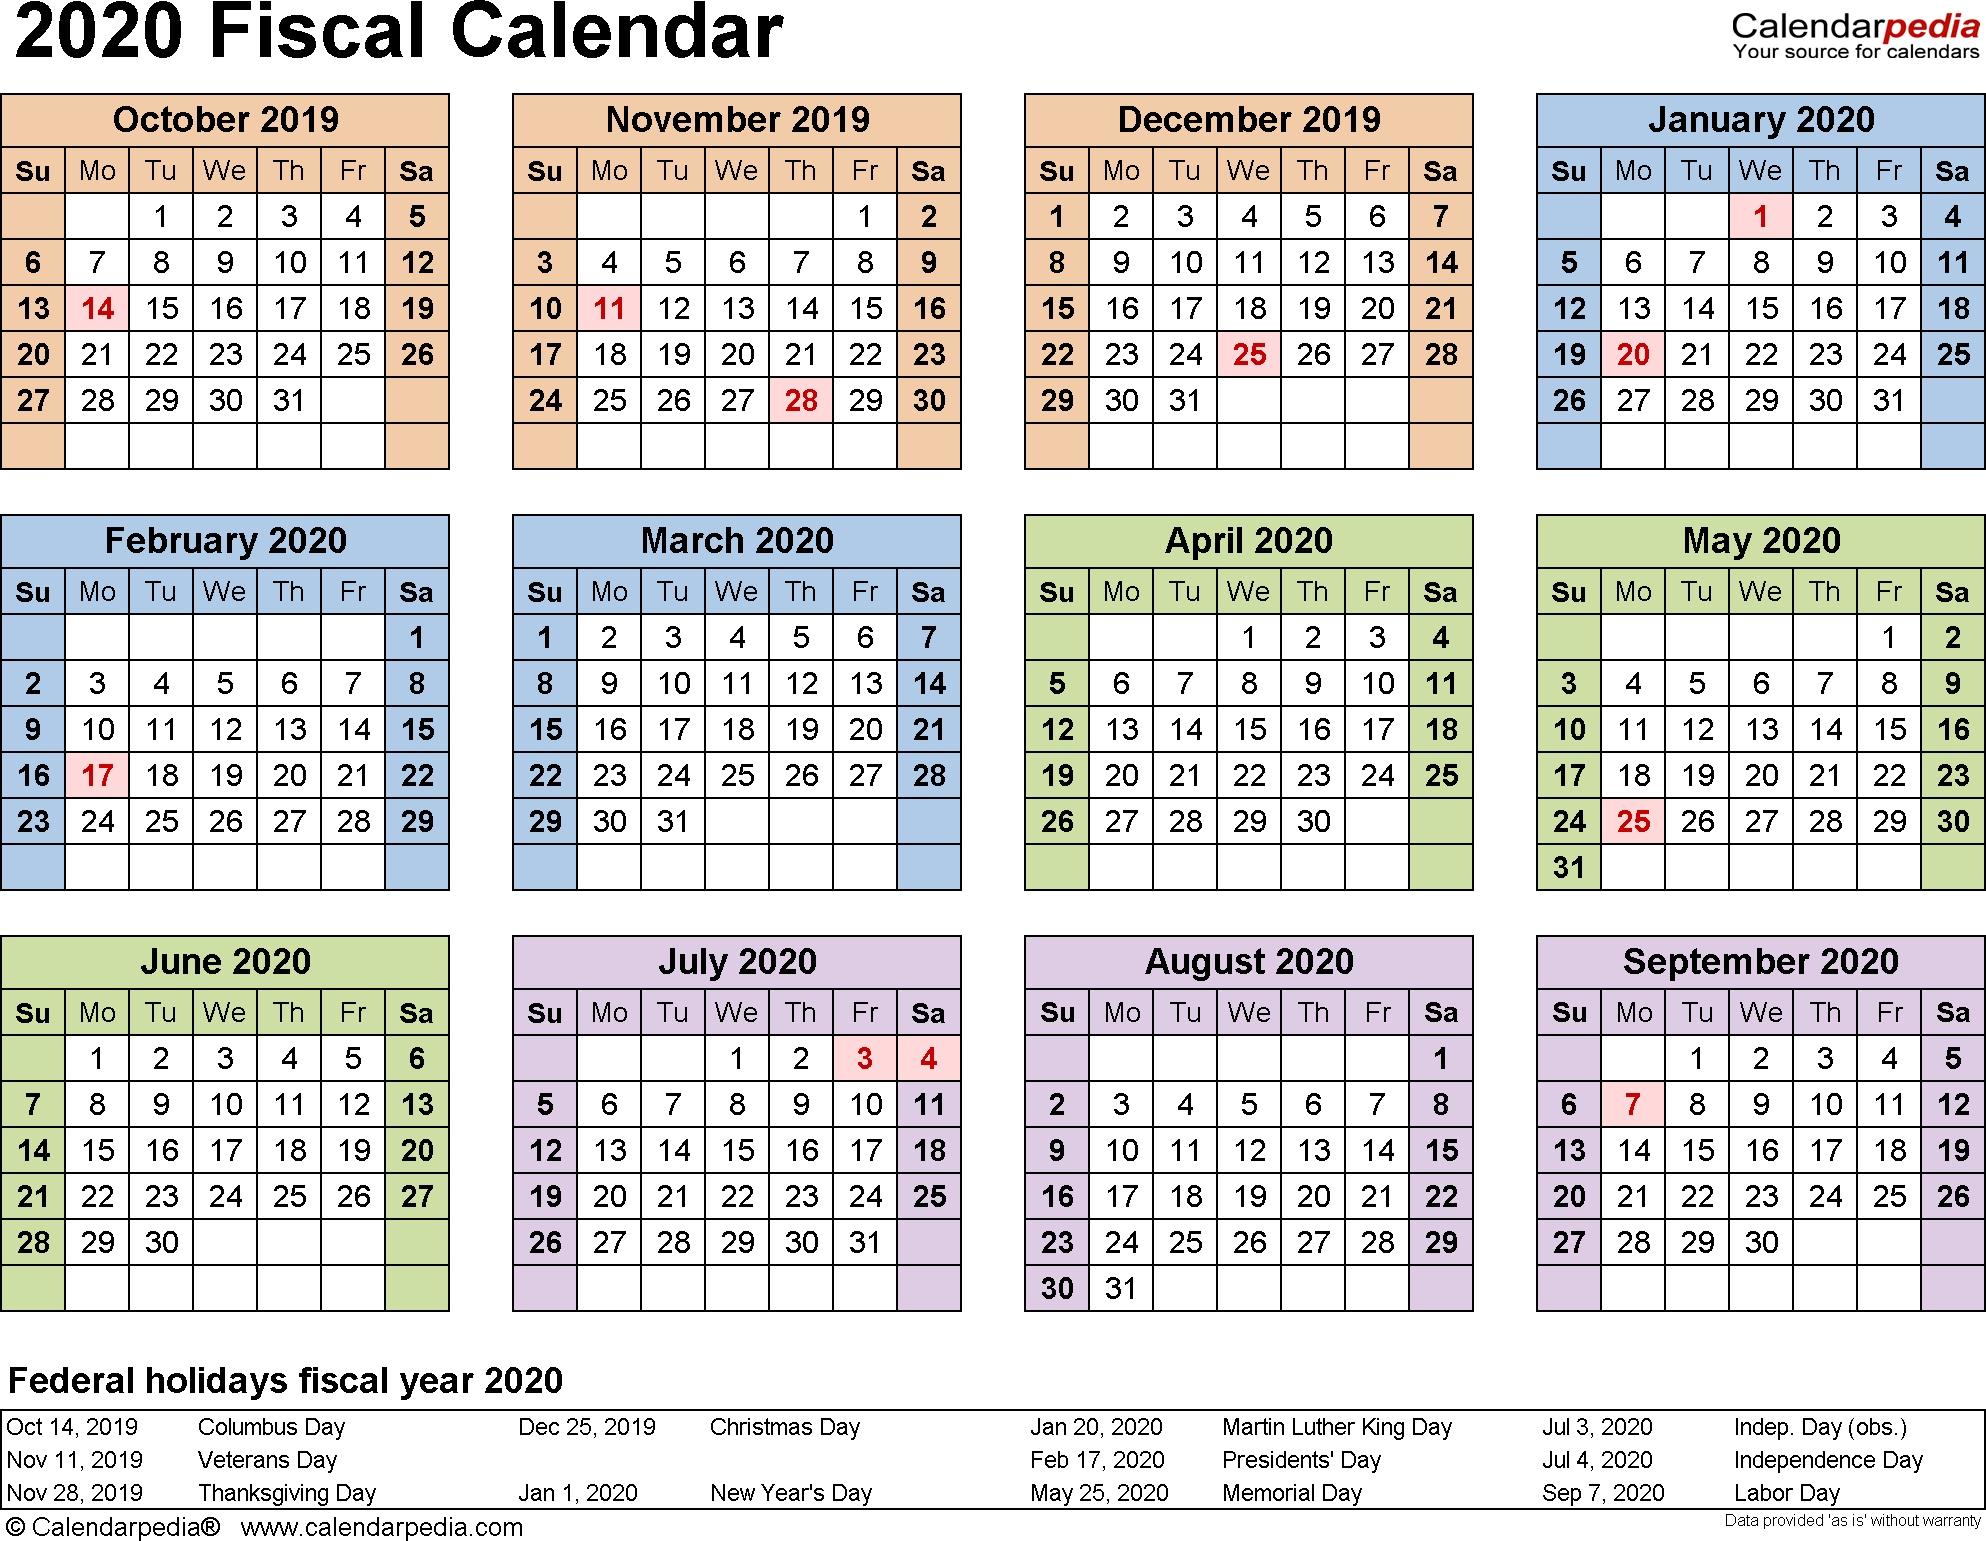 Fiscal Calendars 2020 As Free Printable Excel Templates  Australian Financial Year Calendar 2020 2010